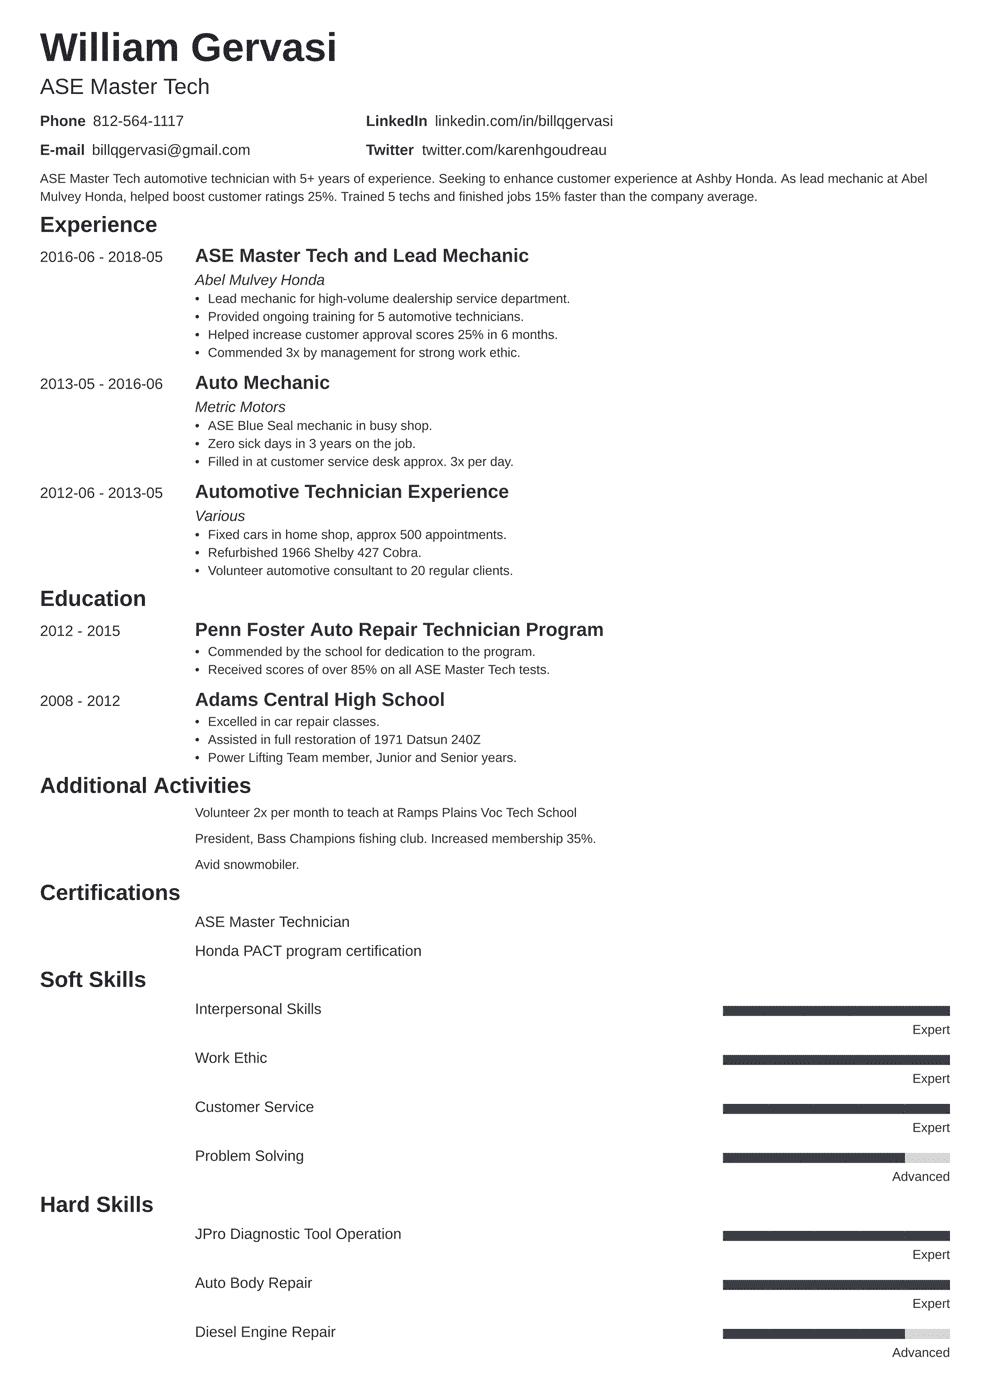 Additional Skills On Resume Examples